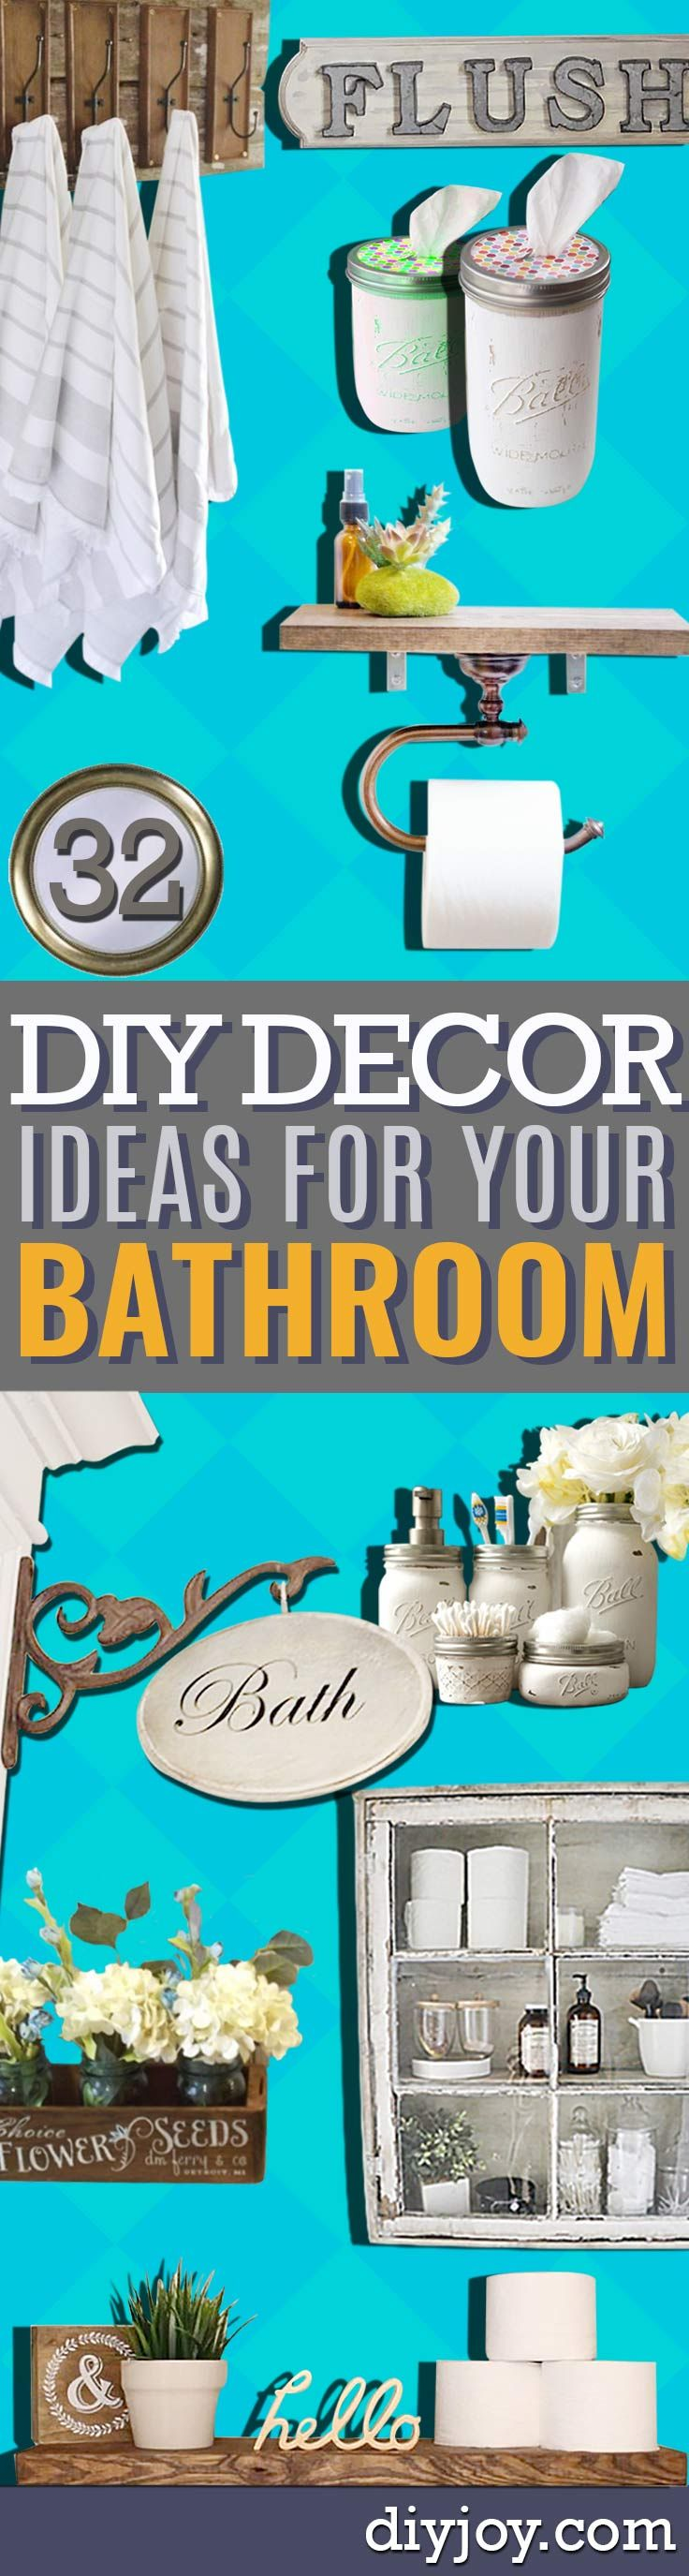 brilliant diy decor ideas for your bathroom diy bathroom decor